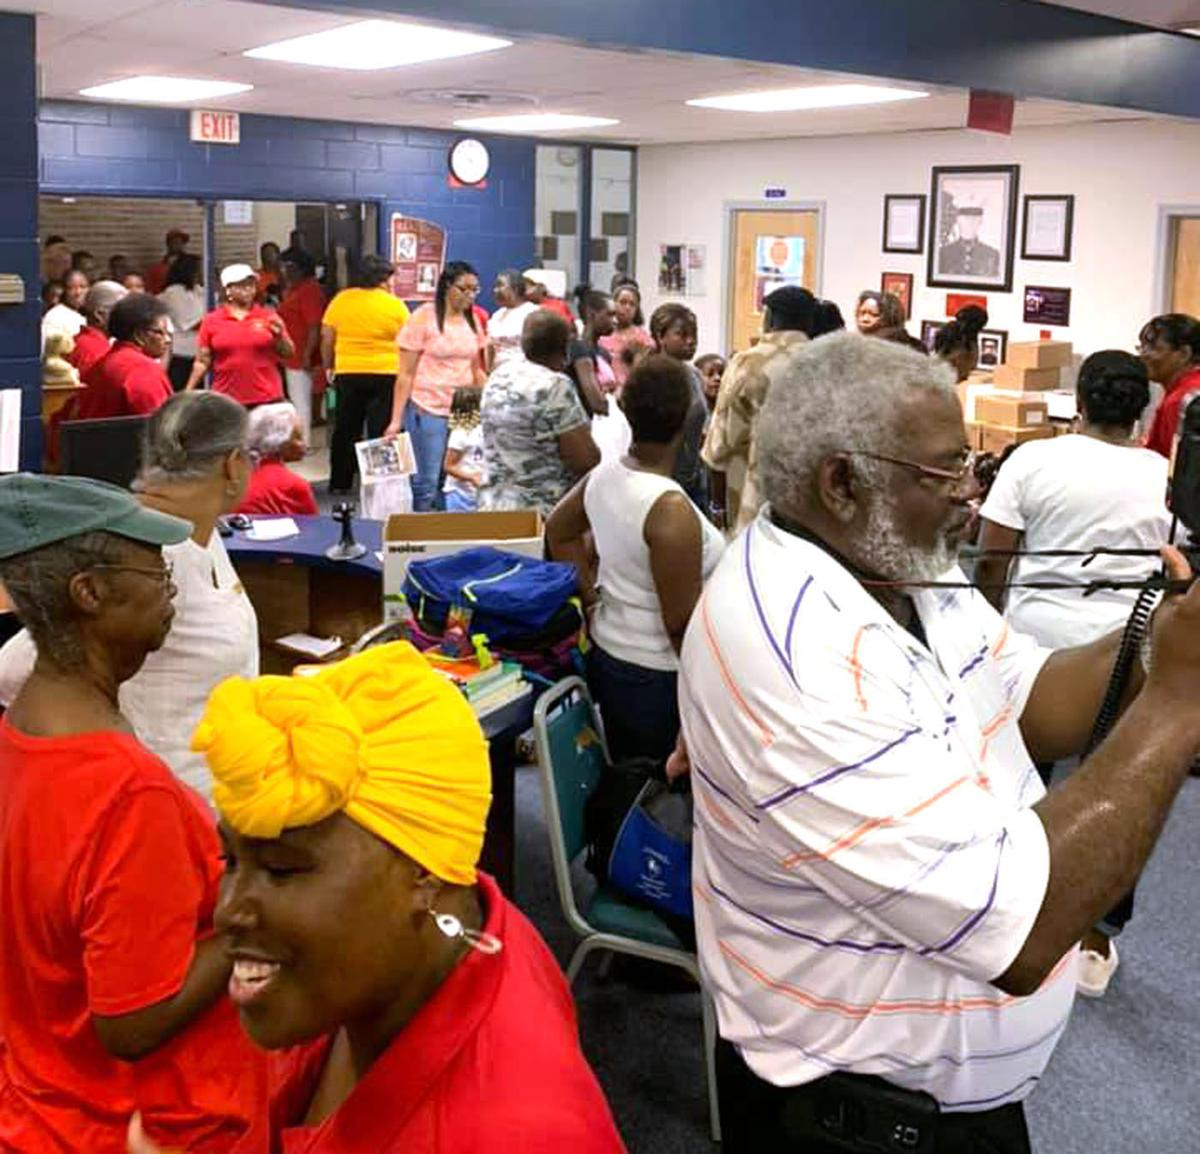 Mullins lodge members serve more than 1,000 people